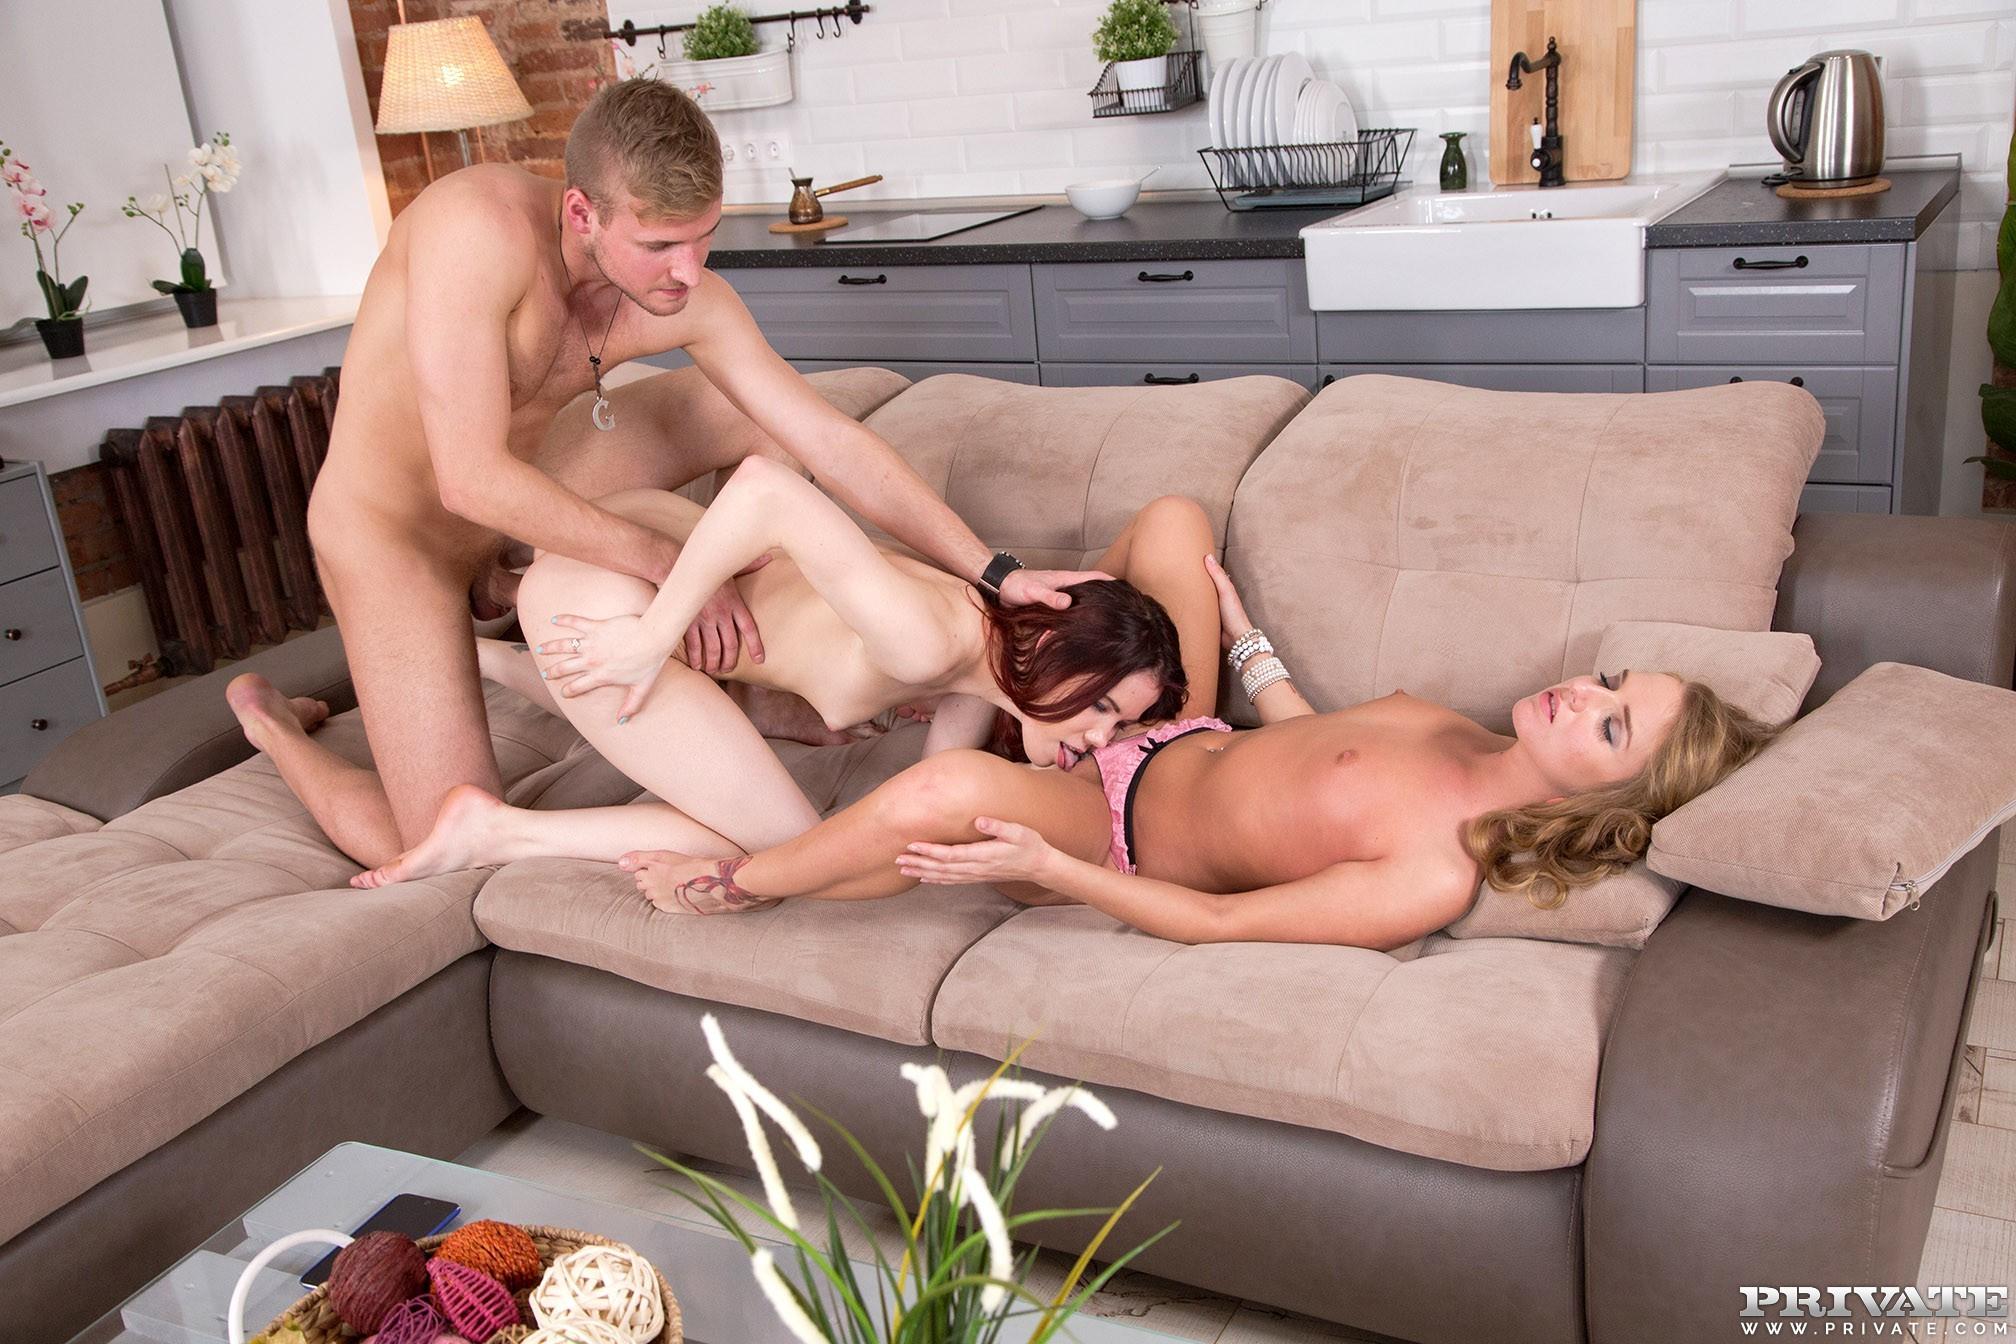 Lovenia Lux и Sofi Goldfinger уговорили парня на секс